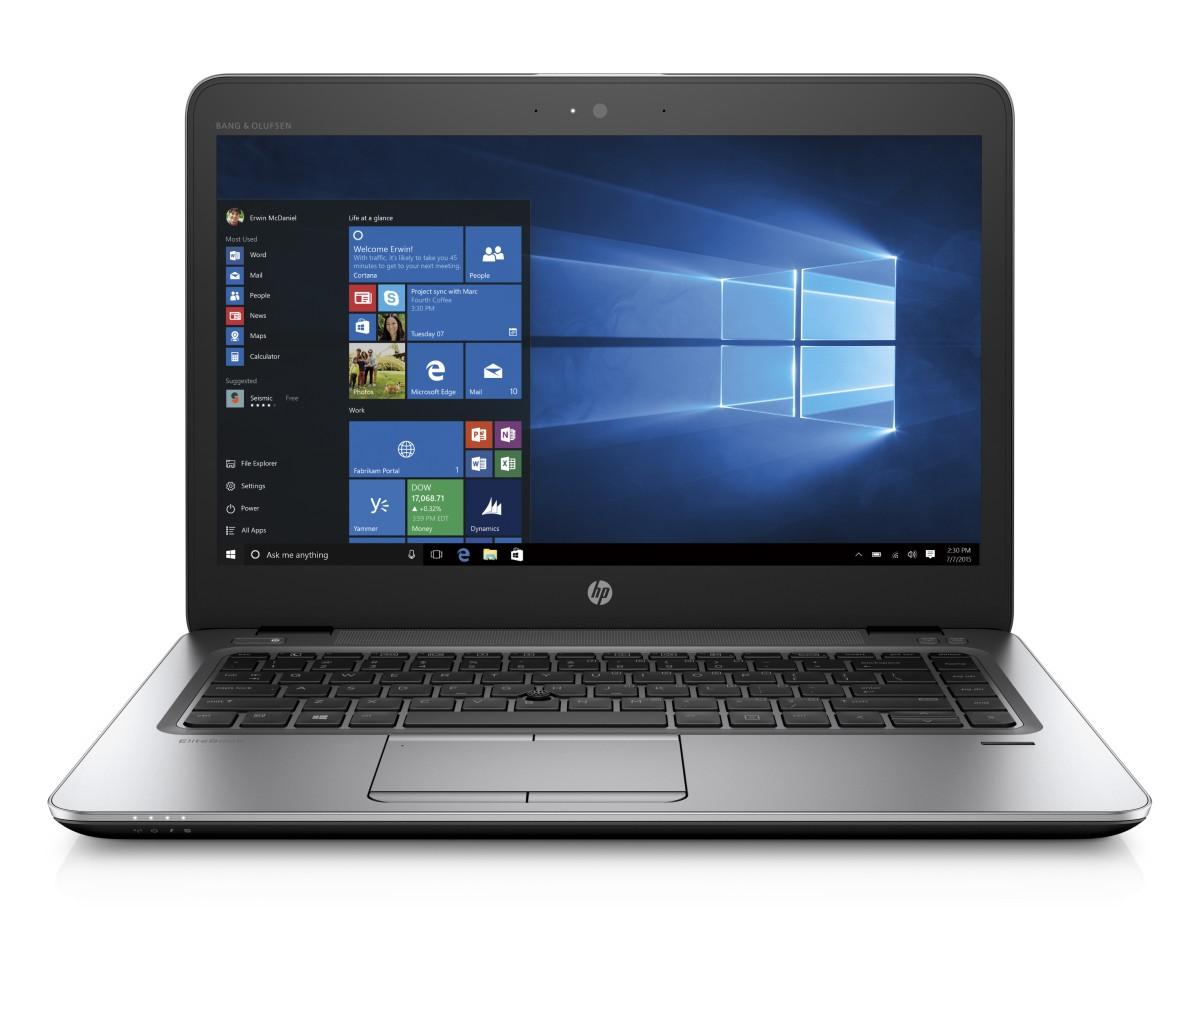 "HP EliteBook 840 G4 14"" FHD/i5-7200U/4GB/256SSD/WIFI/BT/MCR/FPR/3RServis/W10P"